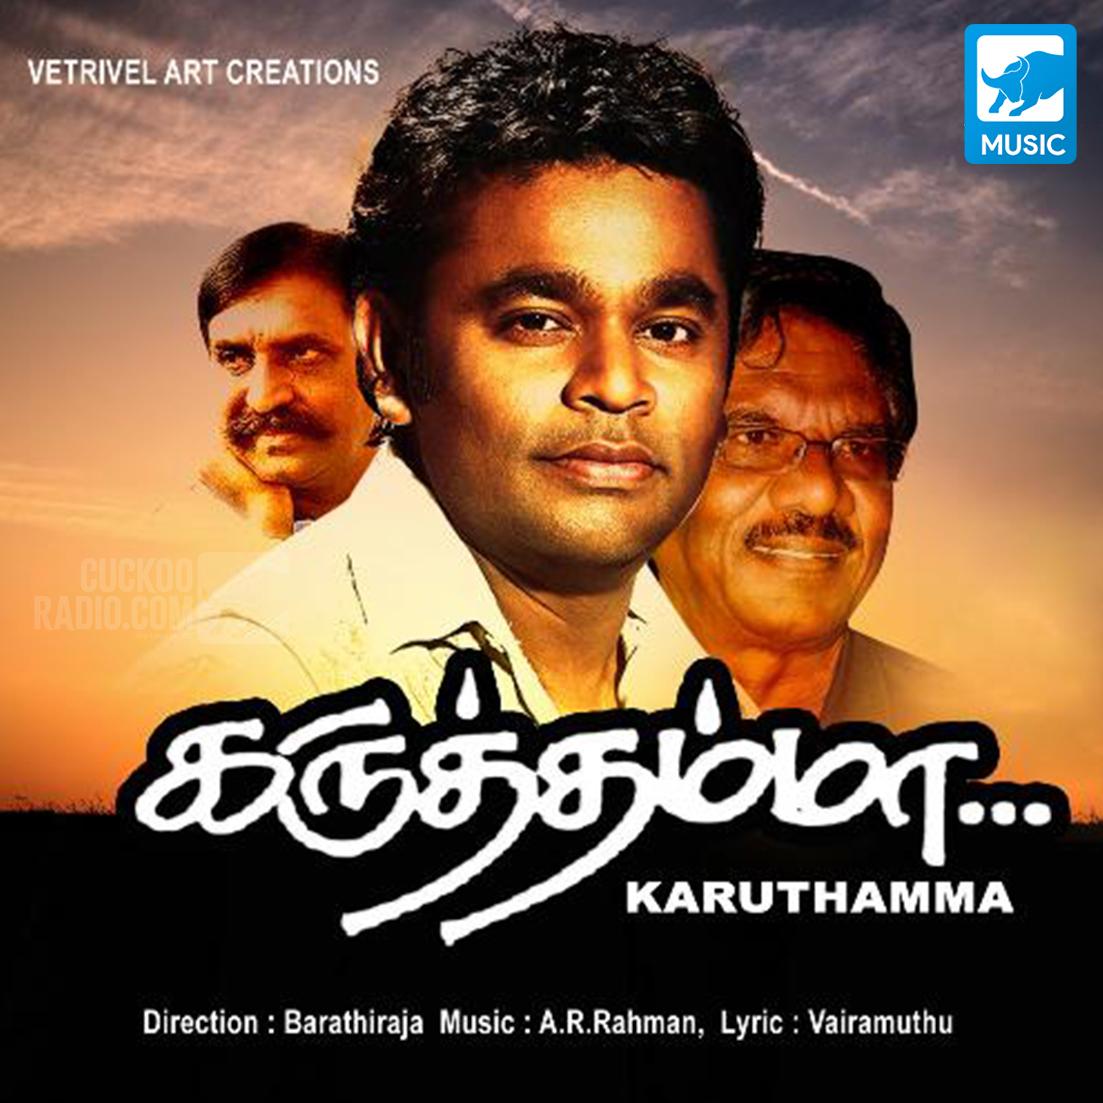 Karuthamma